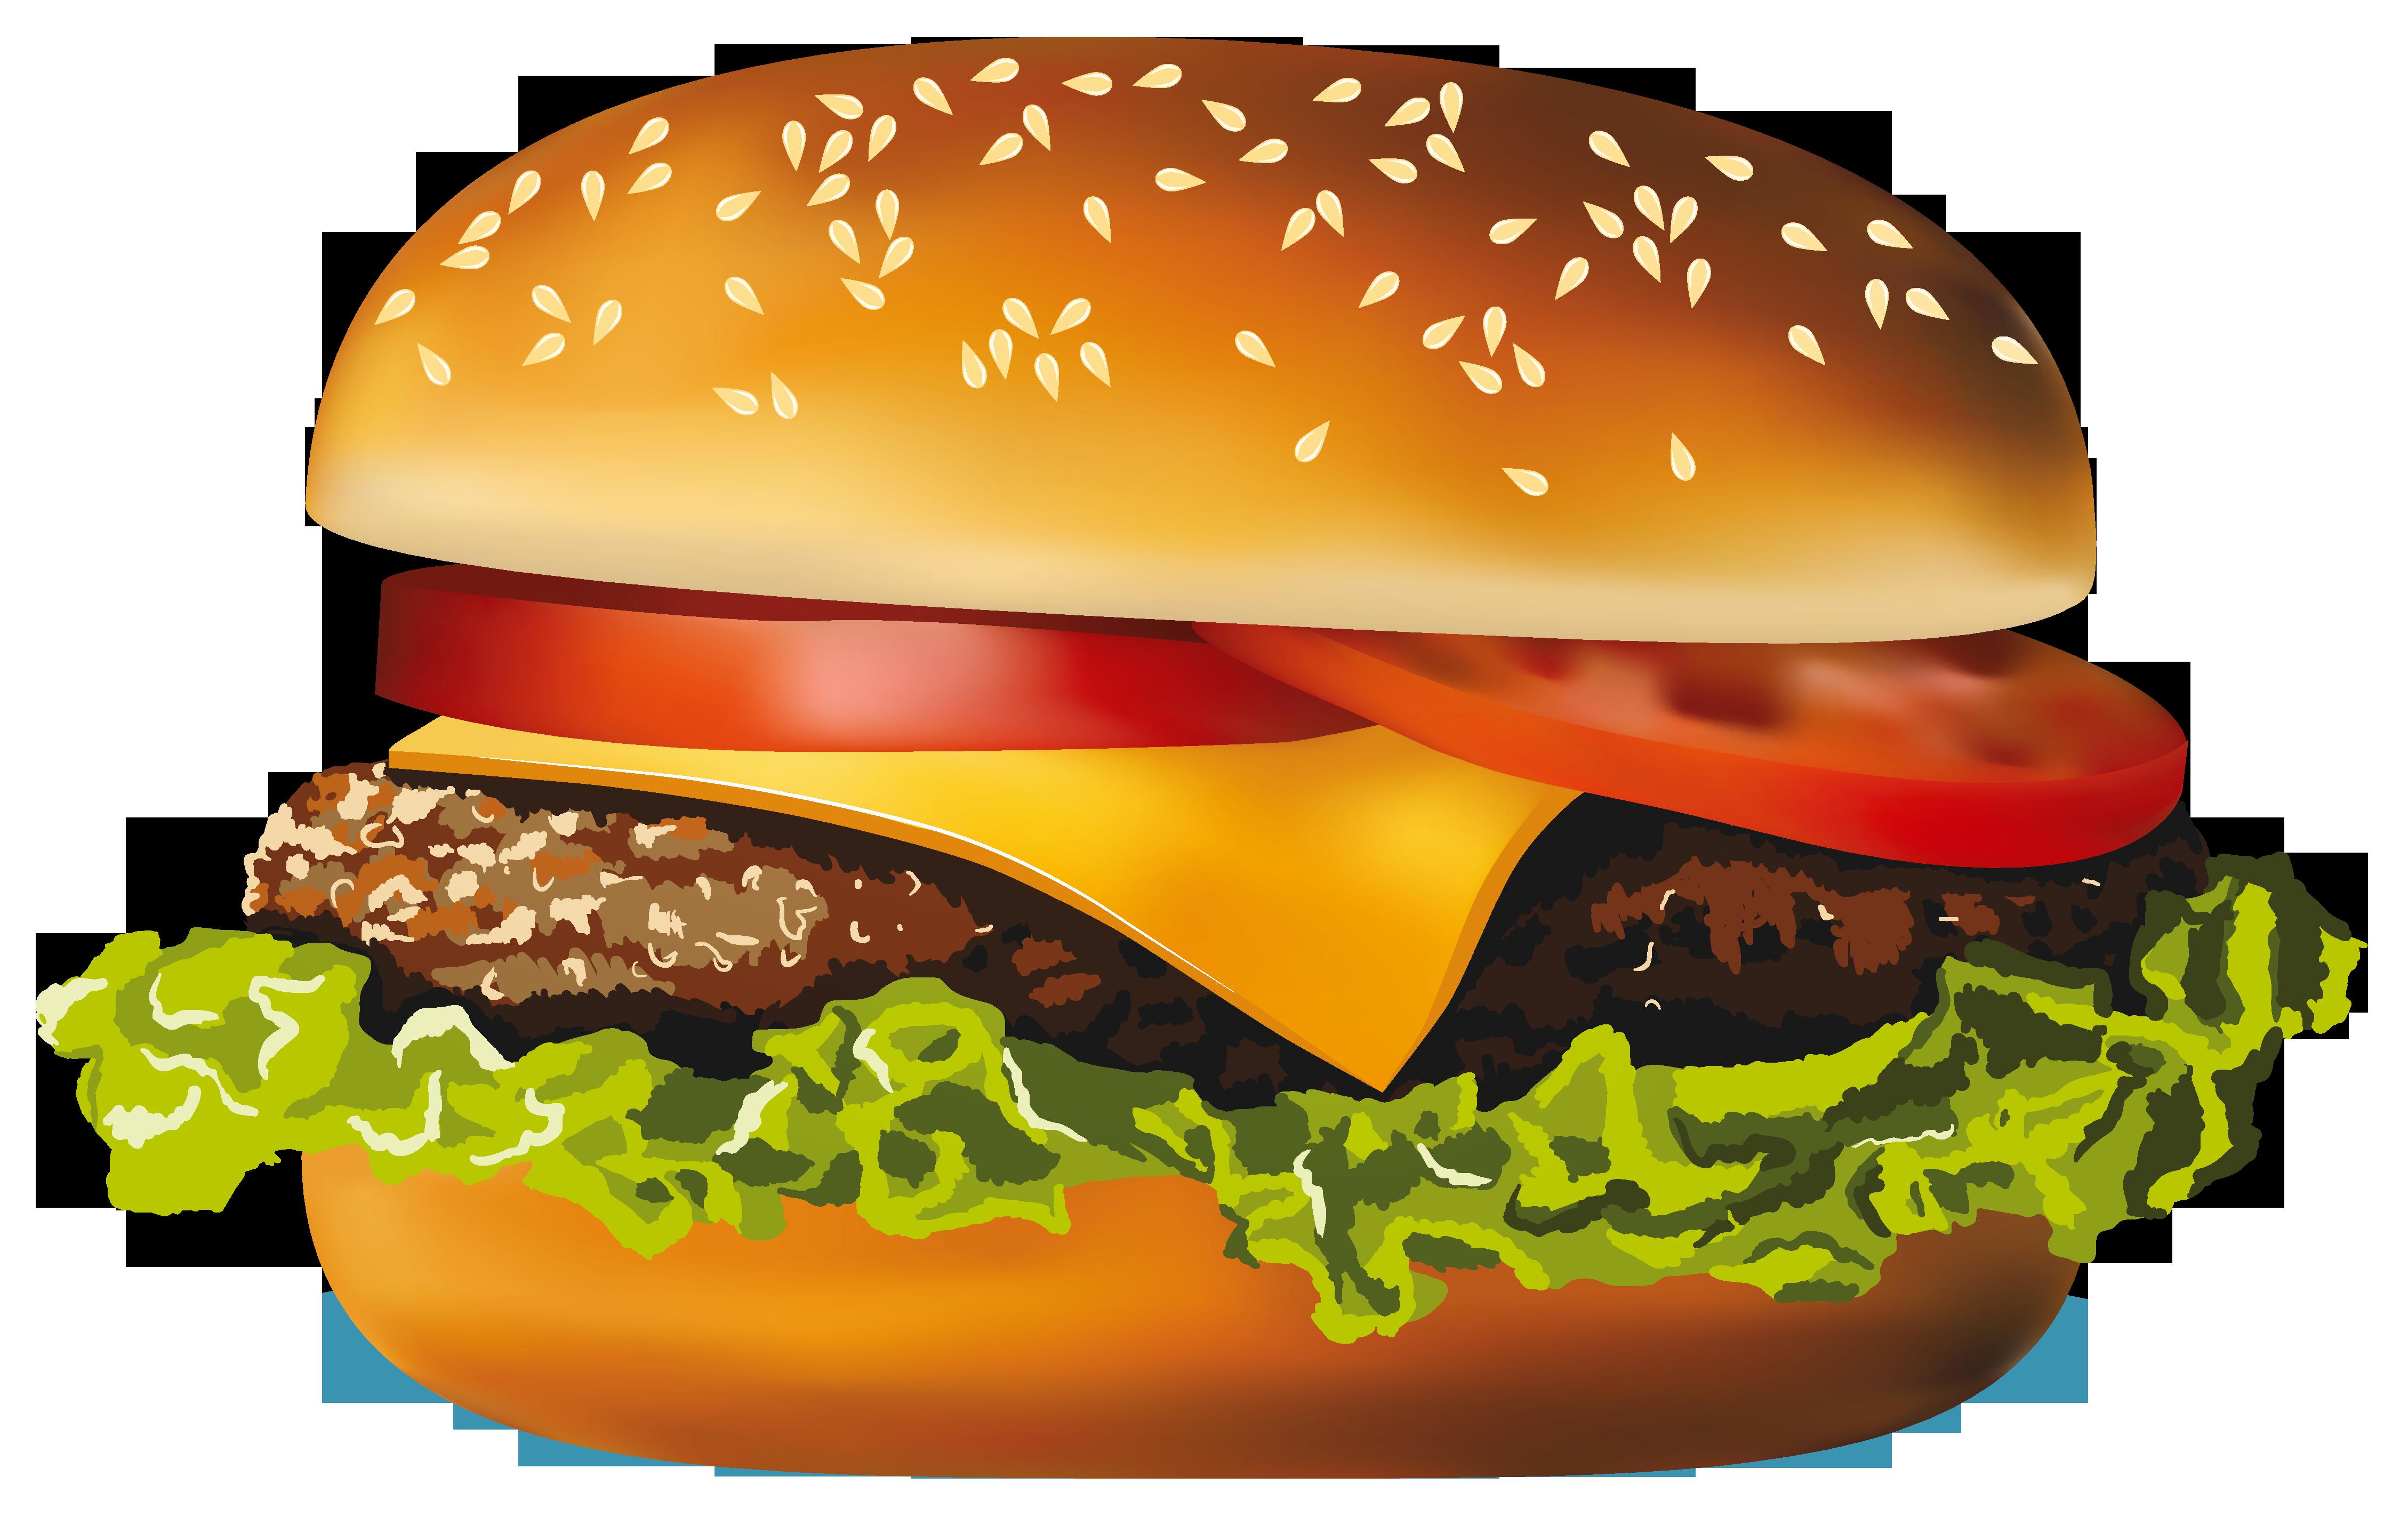 graphic Food clipart hamburger